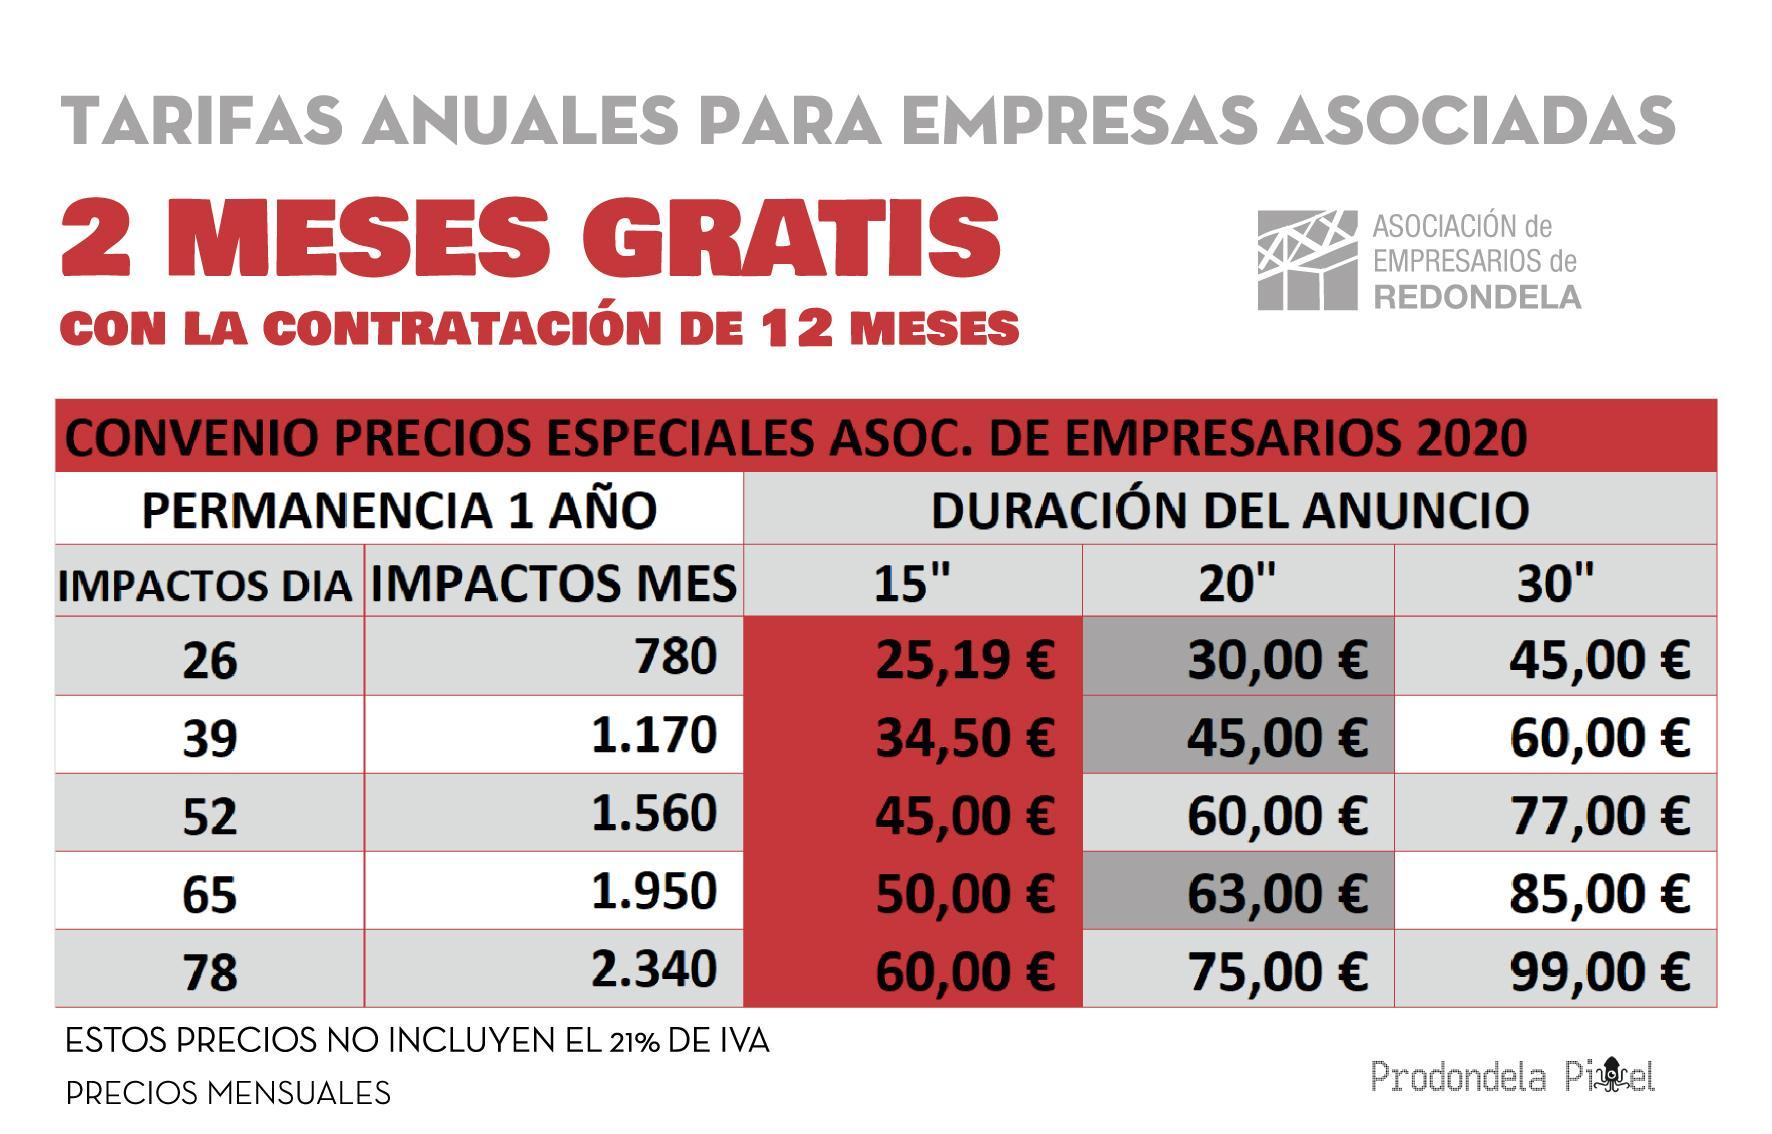 TABLA-DE-TARIFAS-ANUALES.jpg